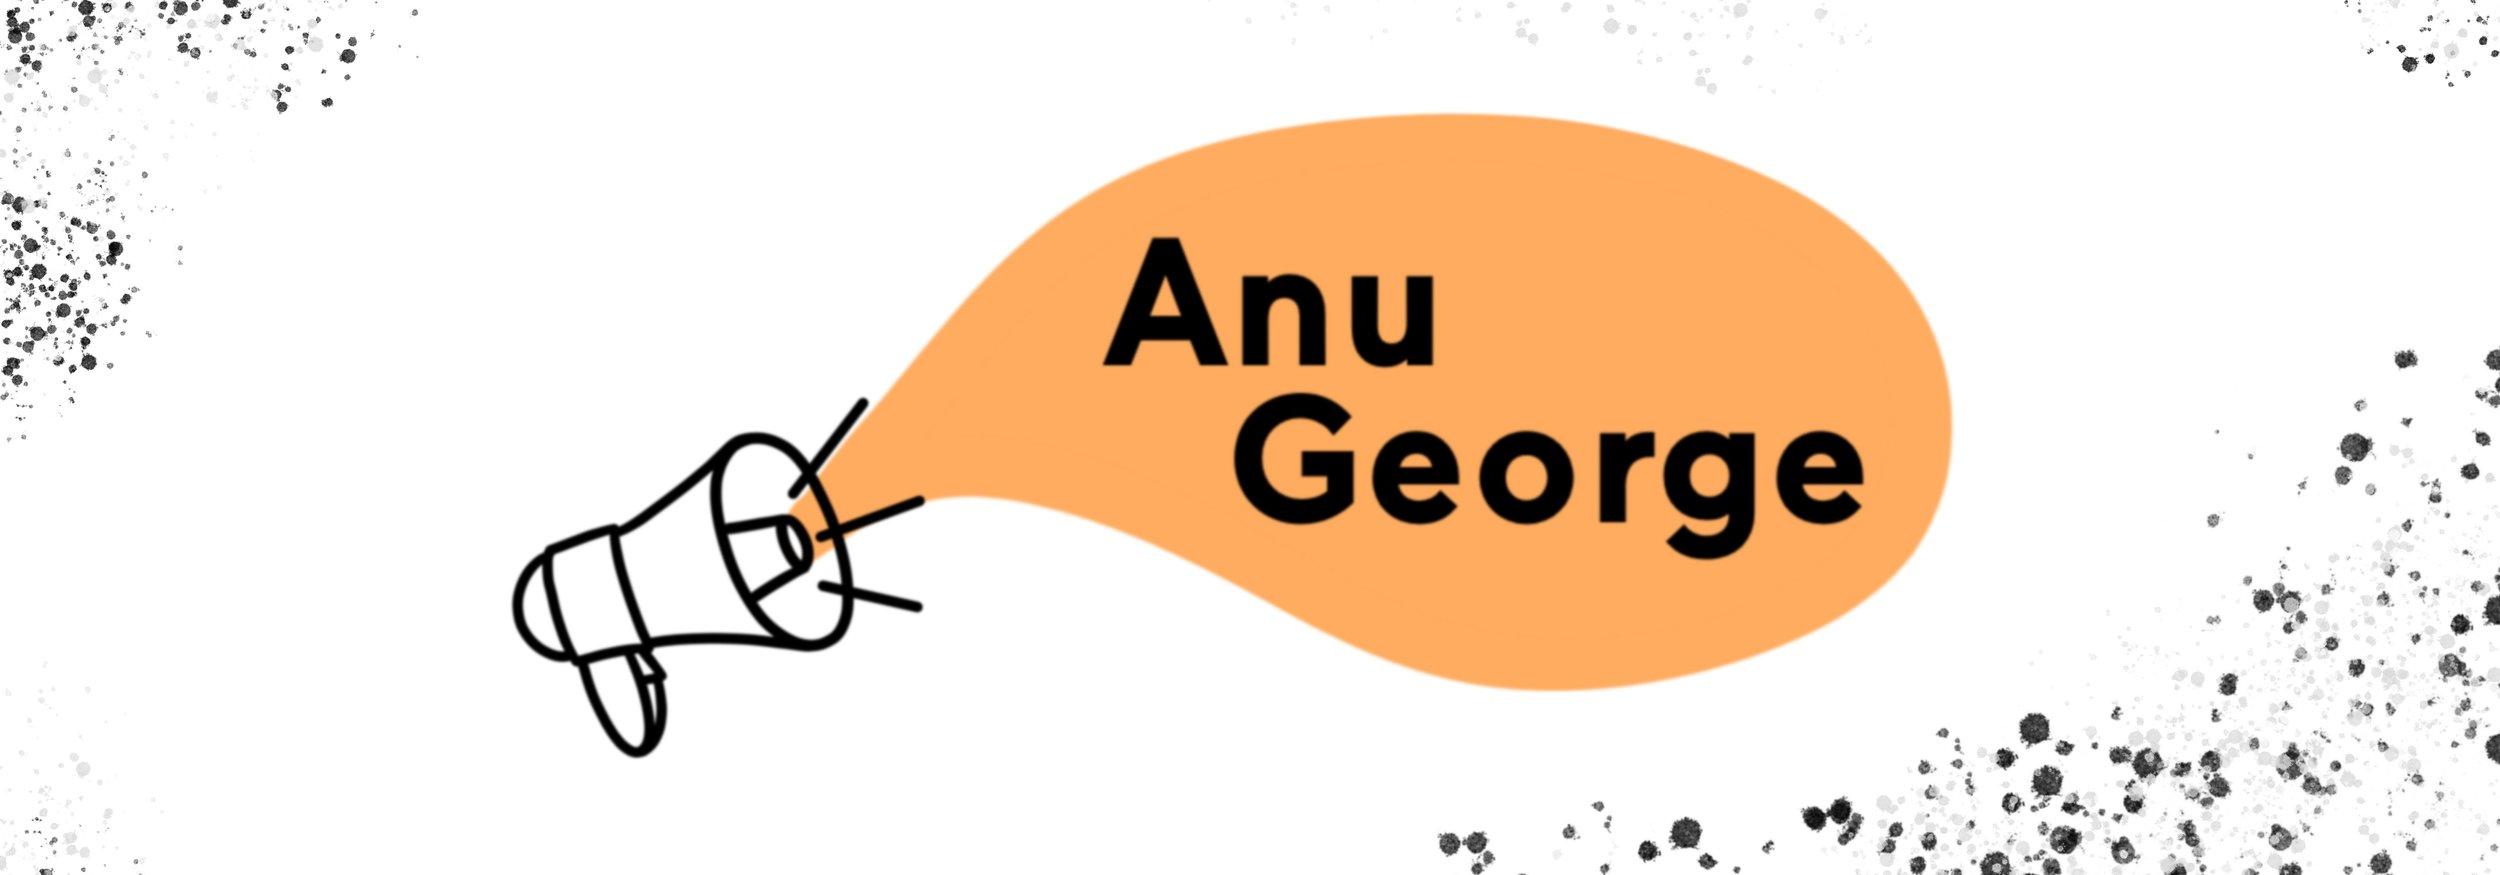 Anu_George_Website_Banner.jpg